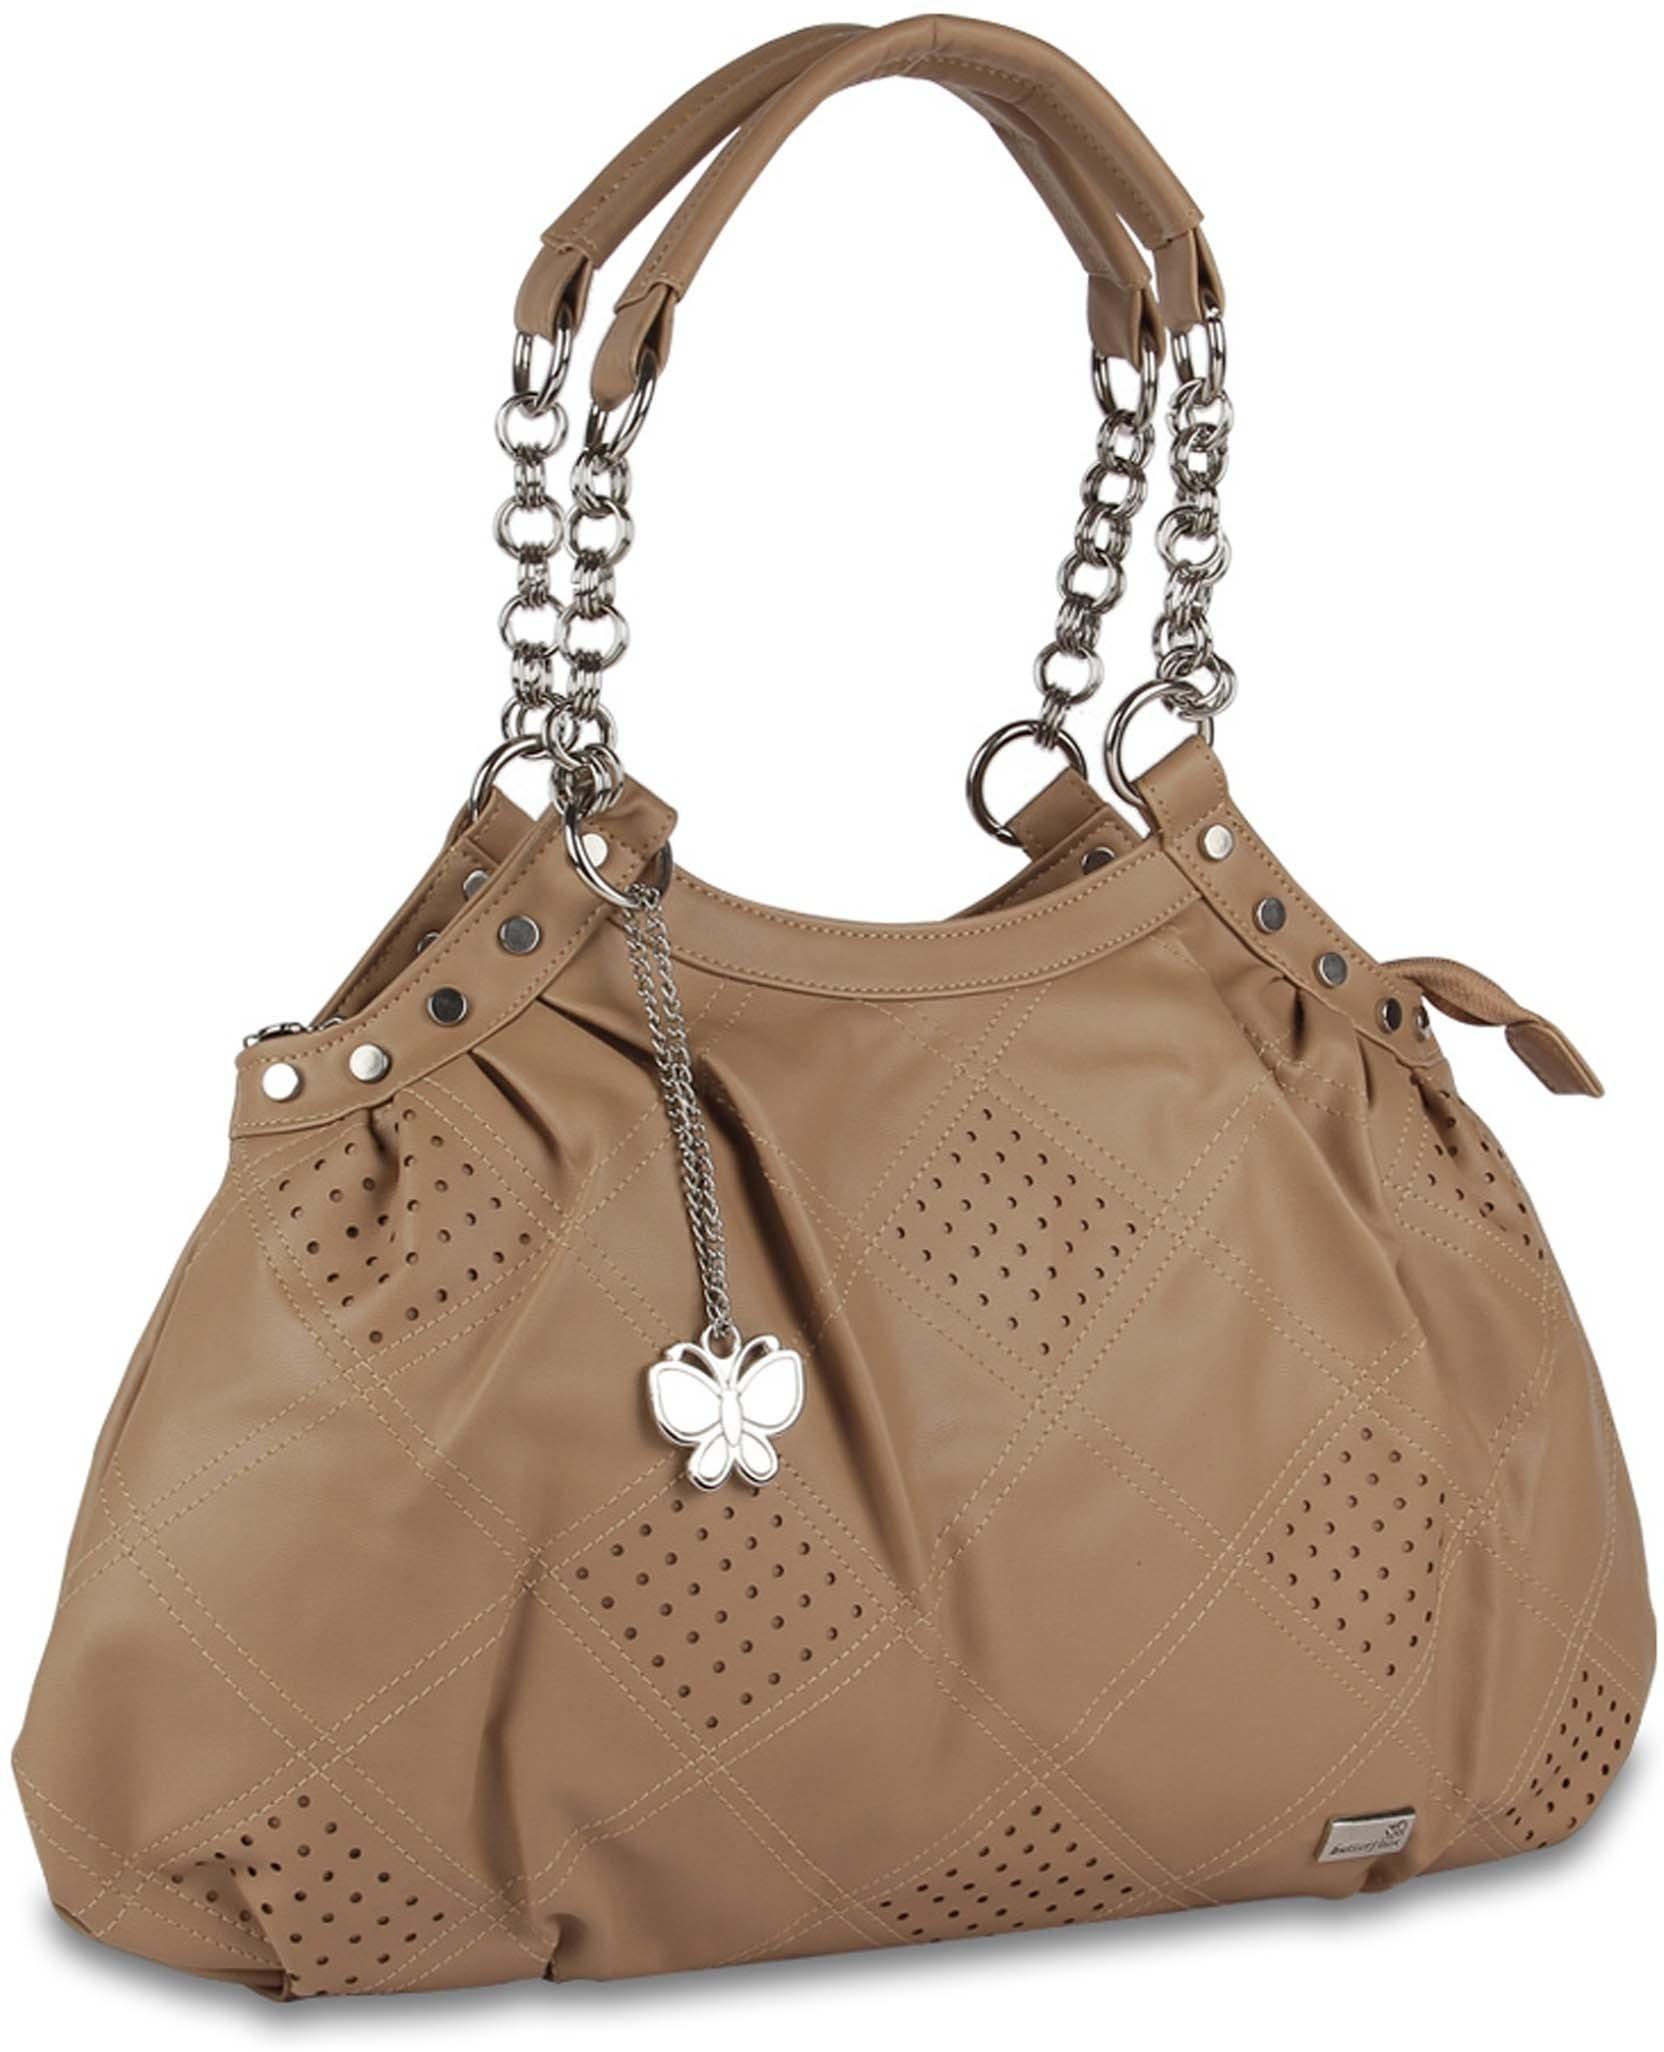 a9b893cbfc7d Handbags Source · Lavie Handbags On Snapdeal Best Handbag 2018 Handbags  Upto 80 Off 20000 Styles Women ...